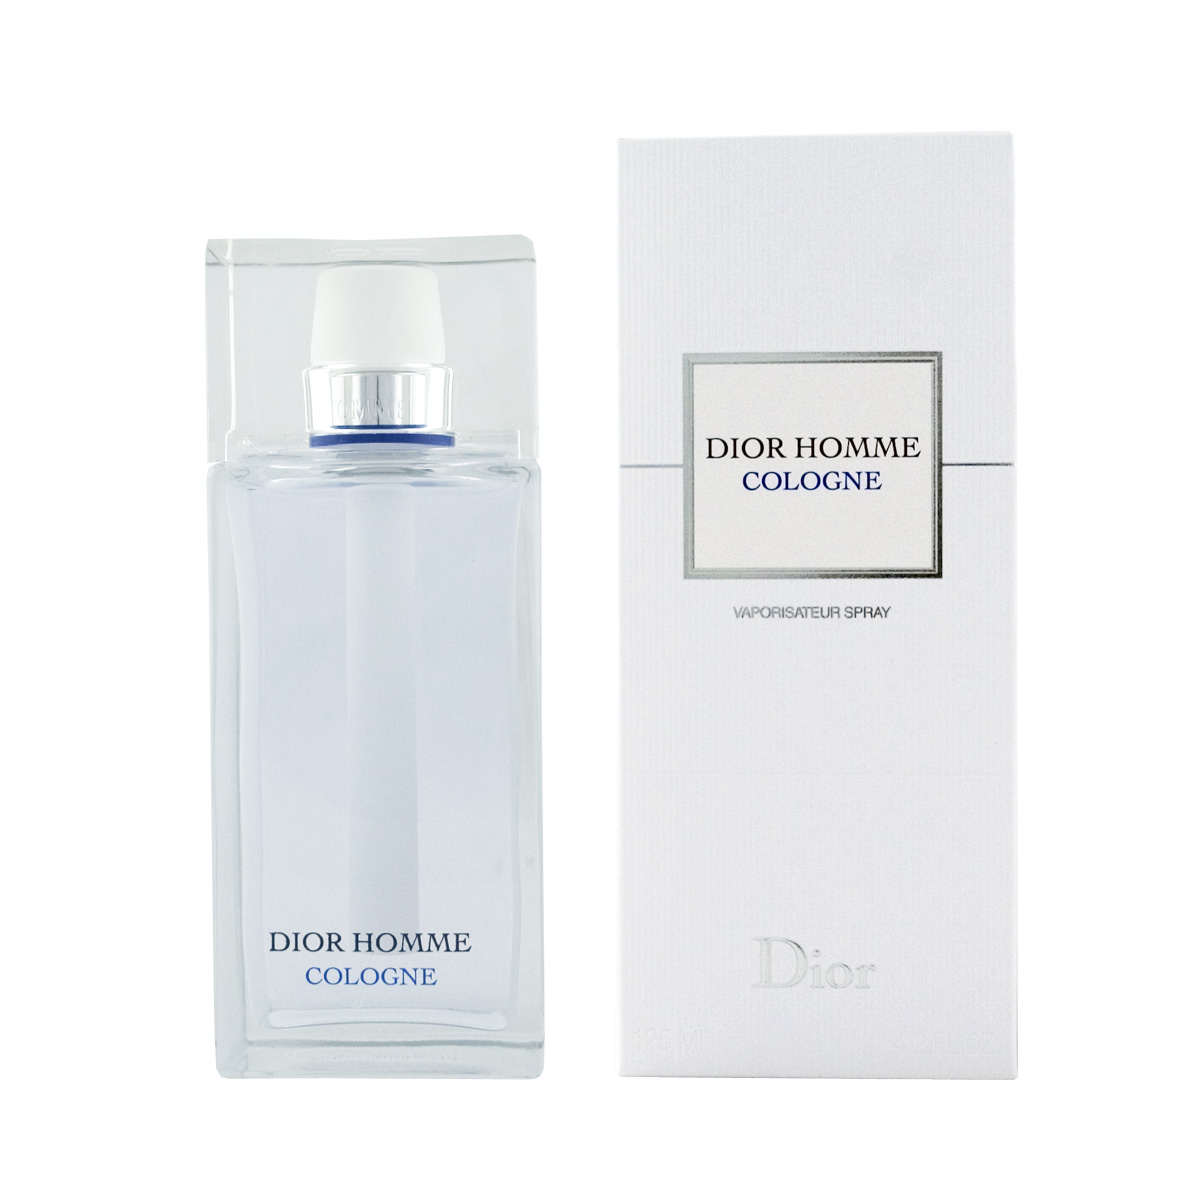 Dior Christian Homme Cologne 2013 EDC 125 ml M